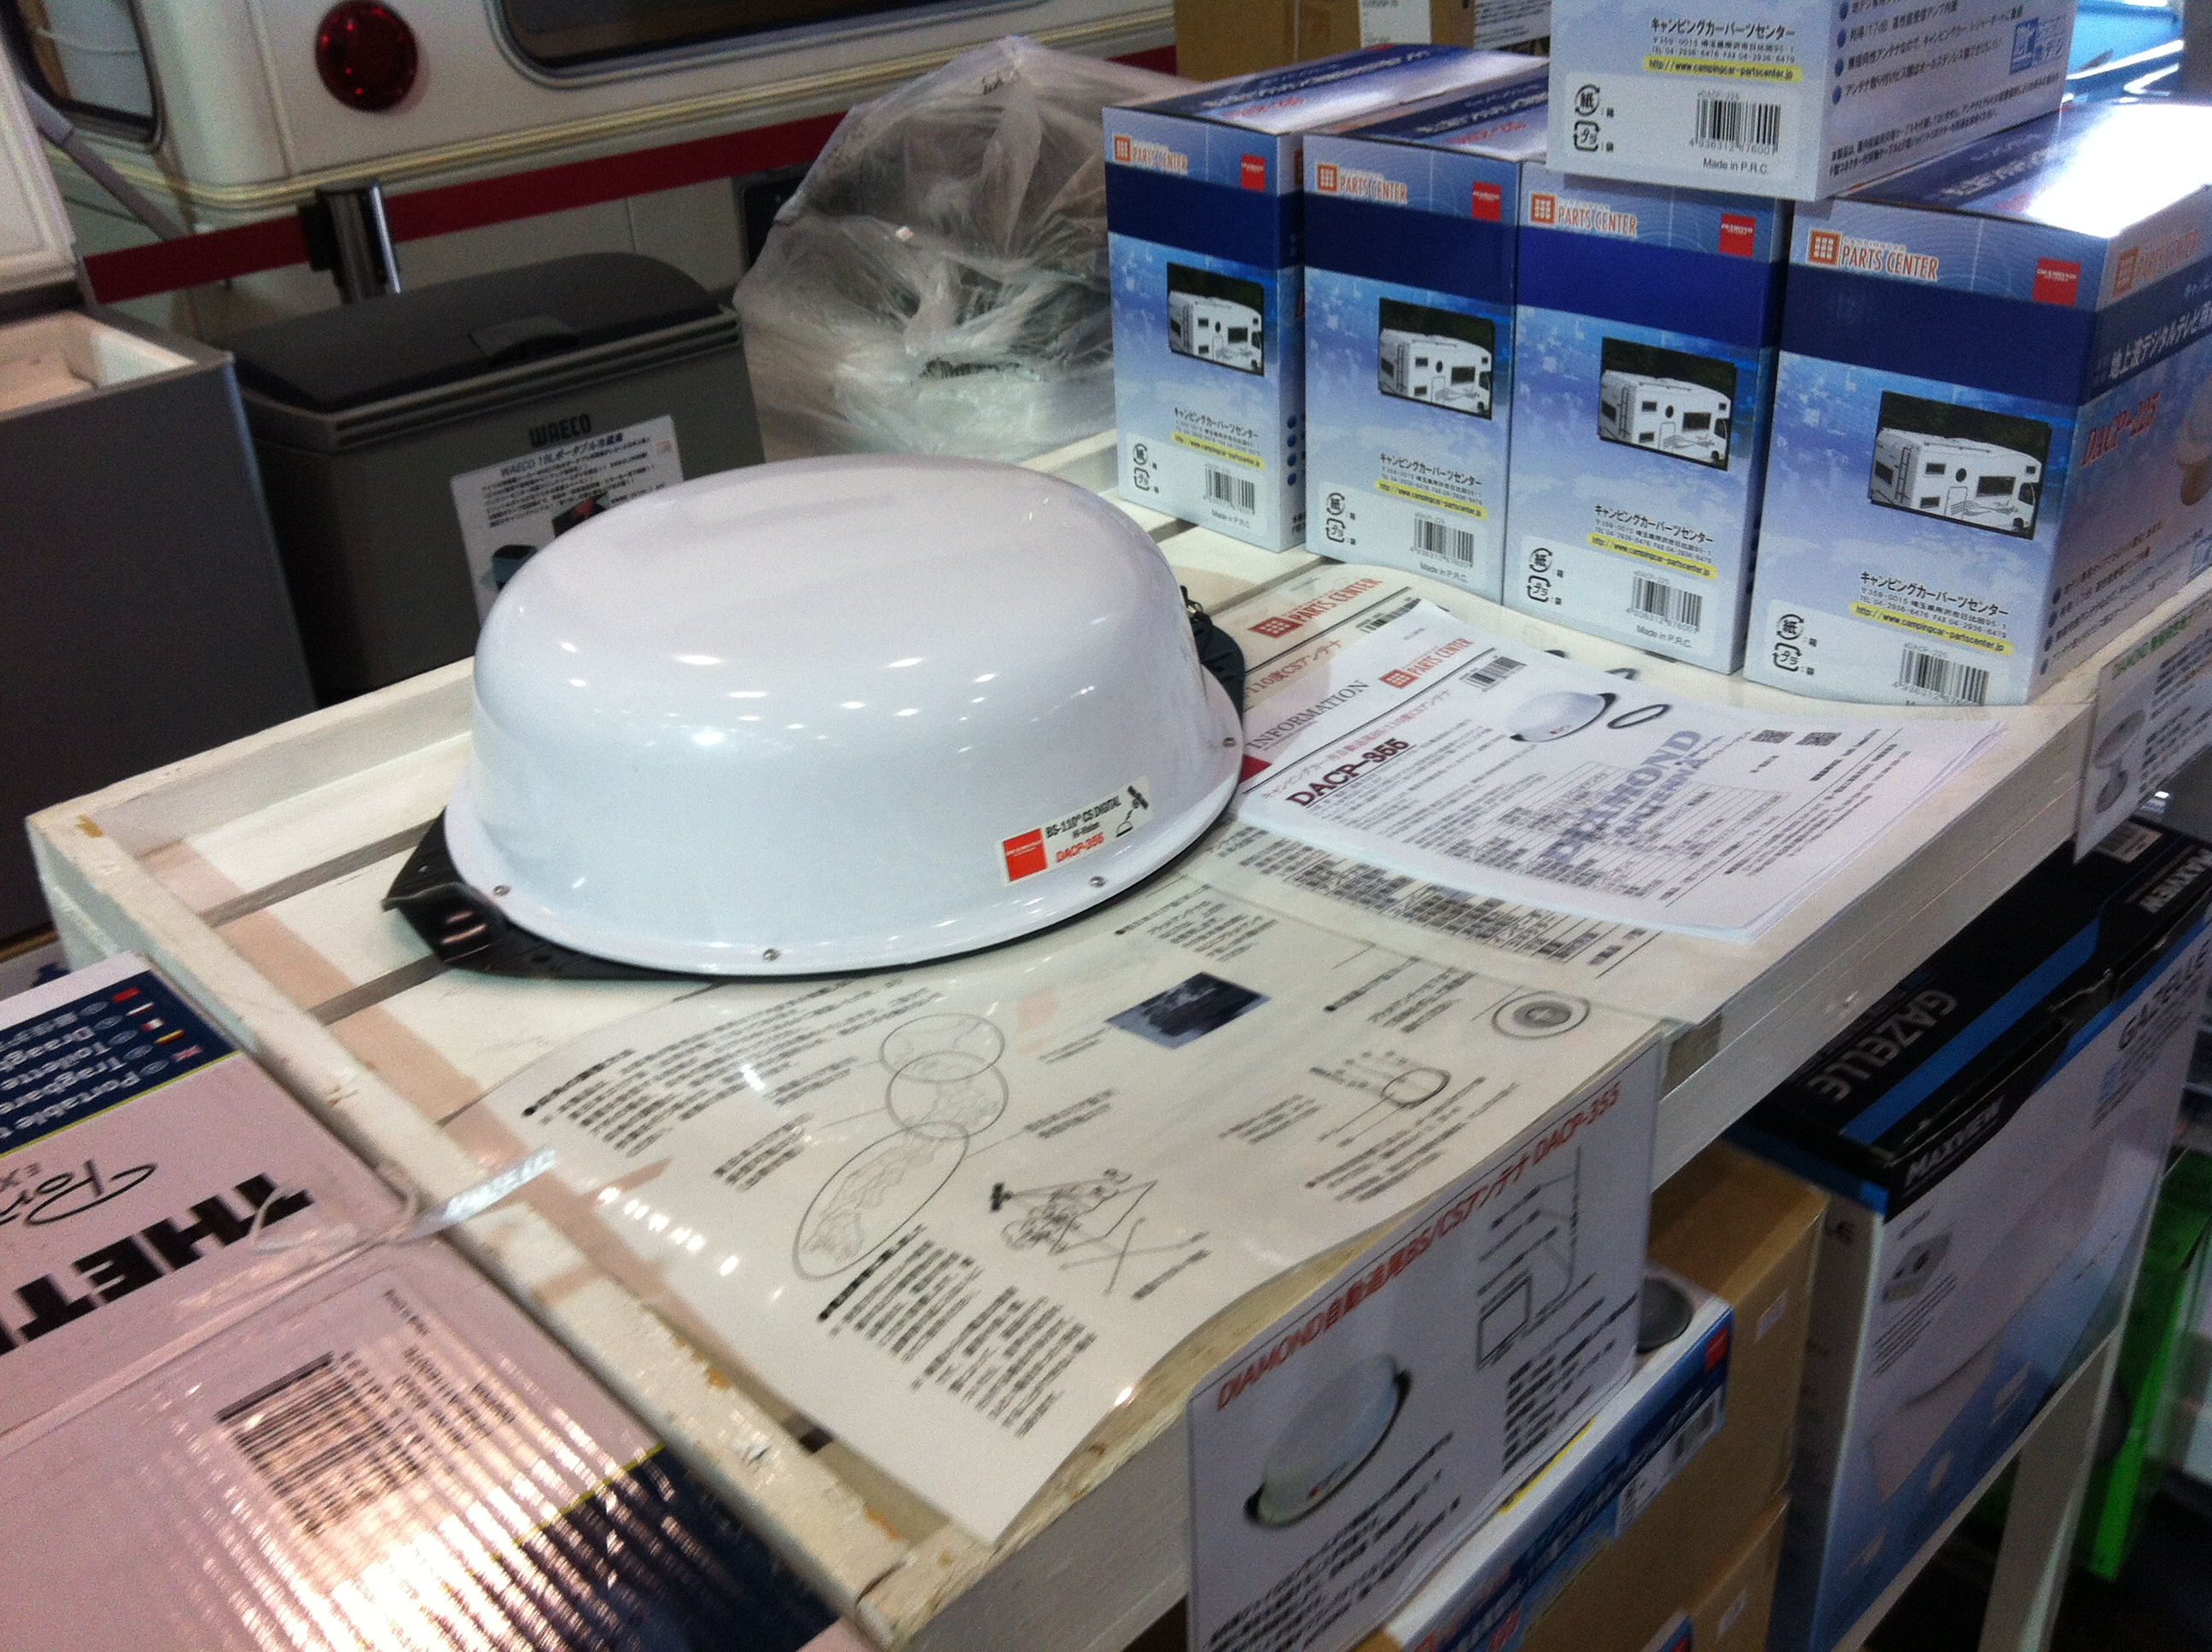 http://www.vantech.jp/shops/info/IMG_6556.JPG